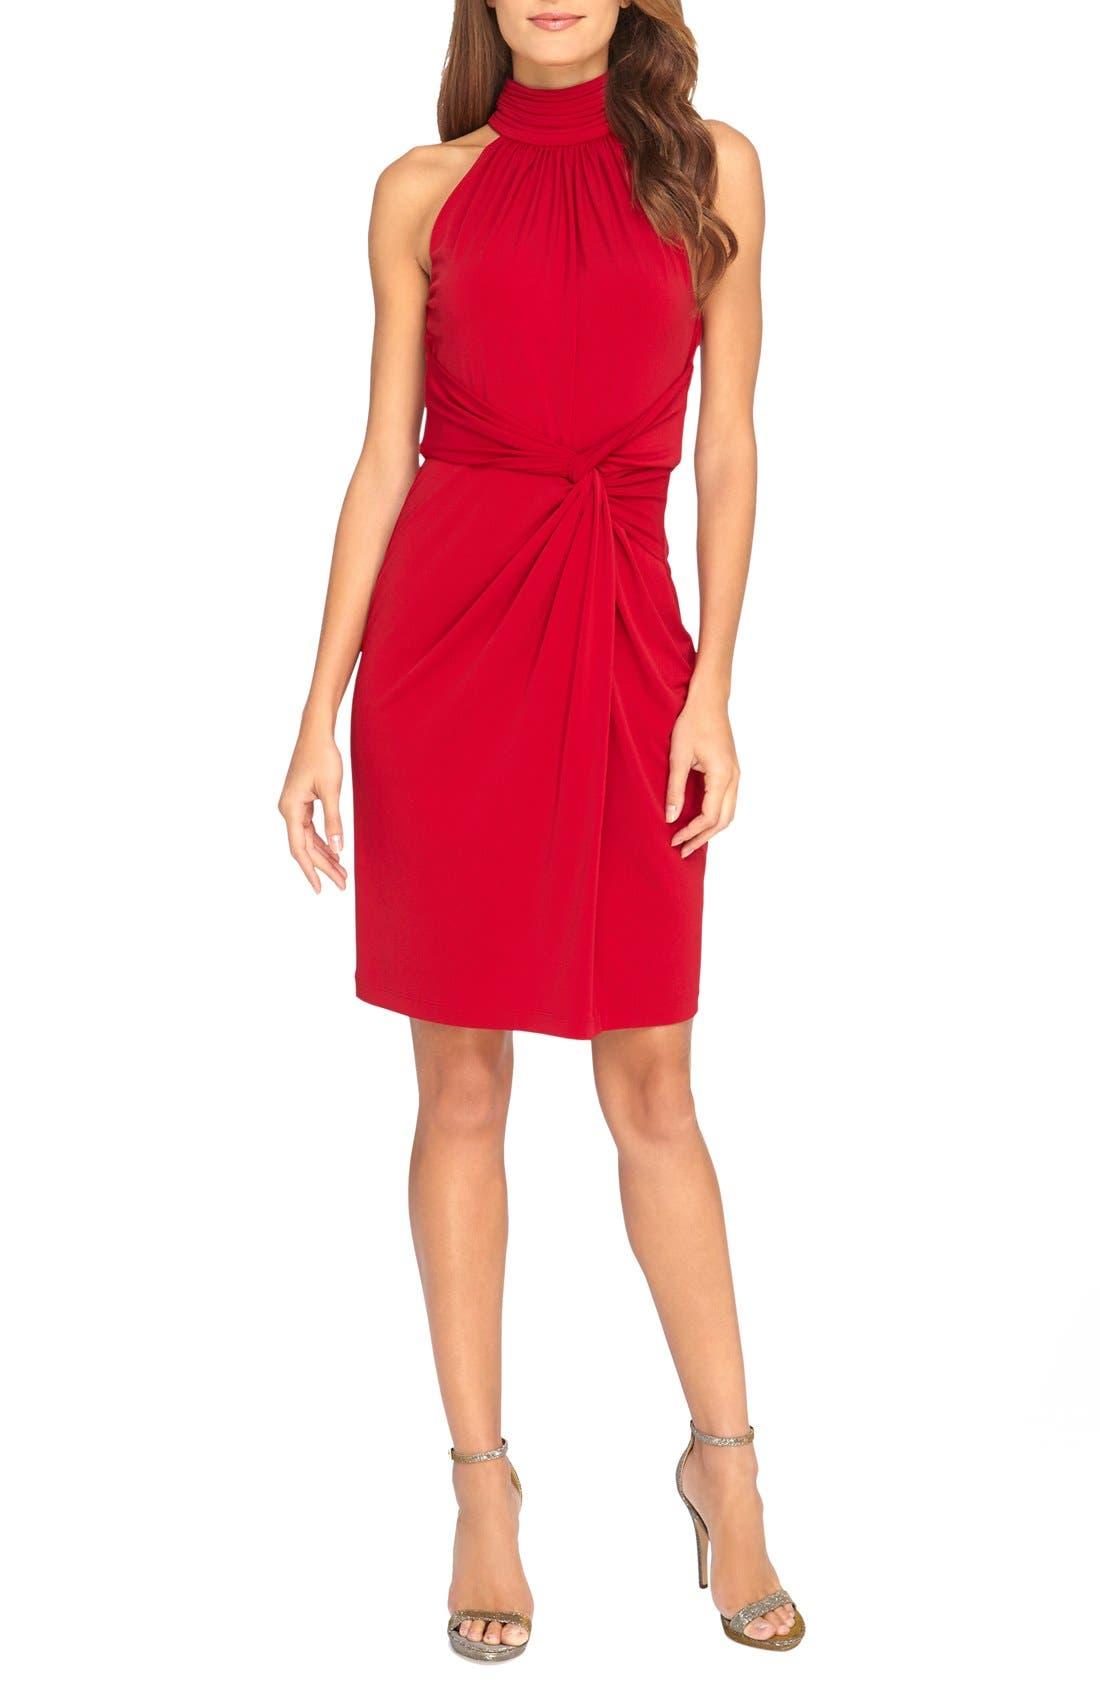 Alternate Image 1 Selected - Catherine Catherine Malandrino 'Jazz' Halter Style Twist Front Dress